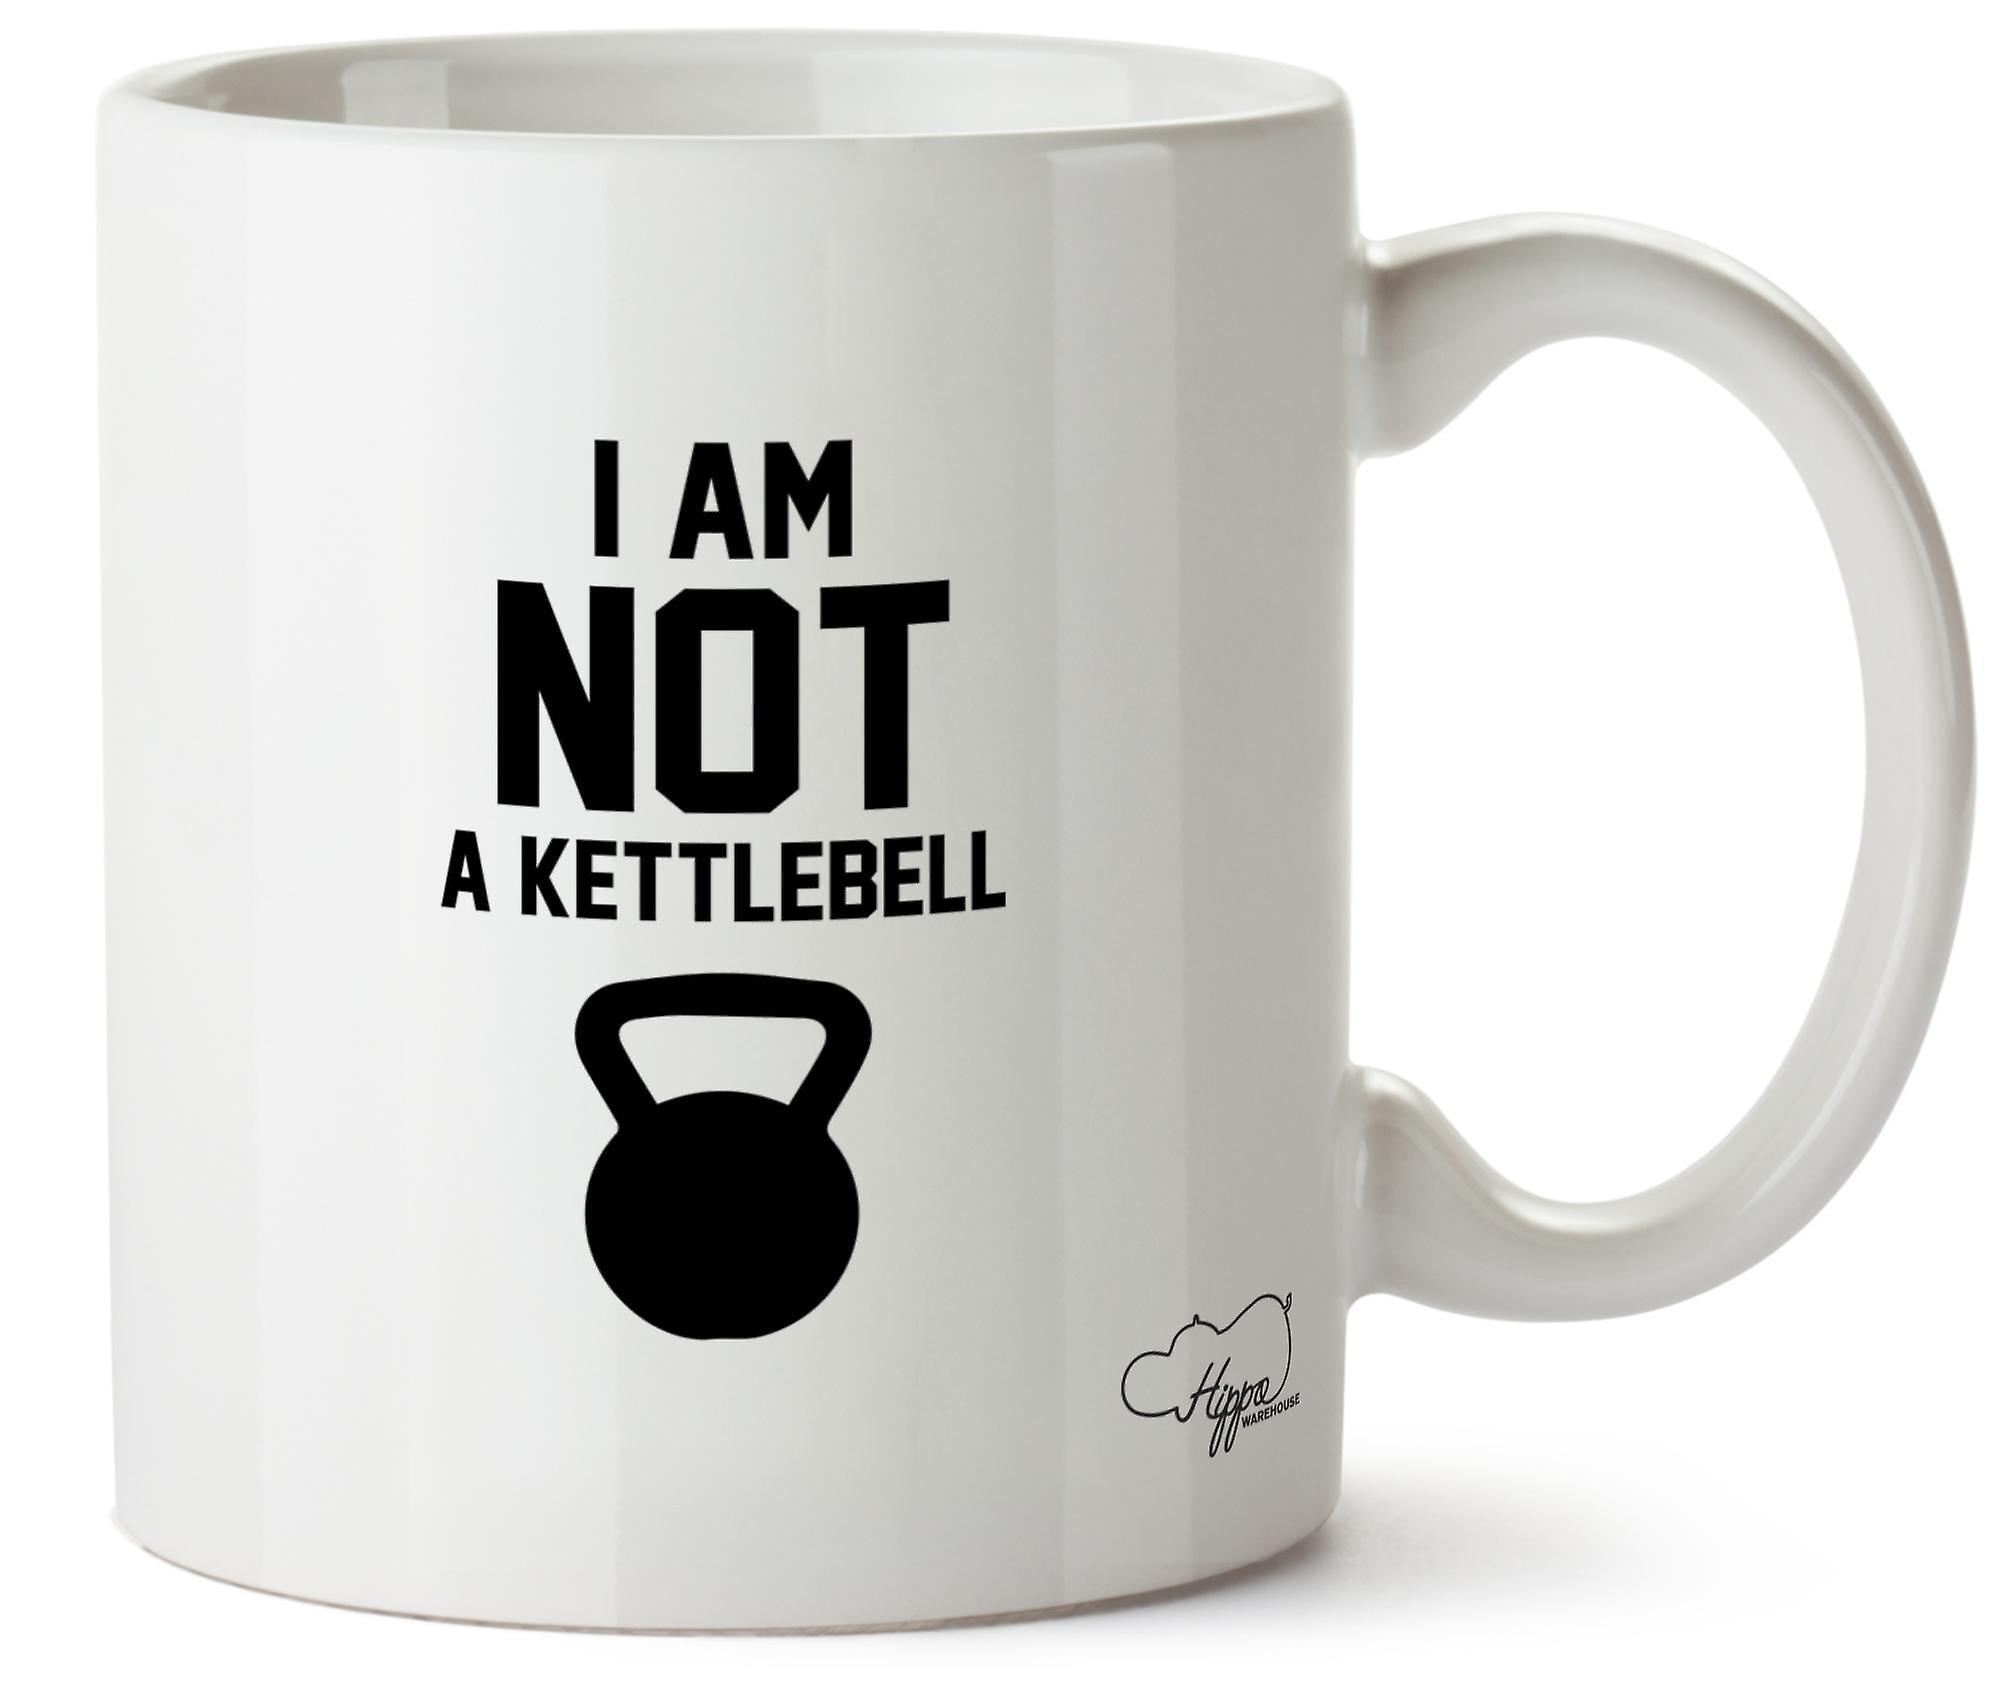 Hippowarehouse I Am Not A Kettlebell Printed Mug Cup Ceramic 10oz